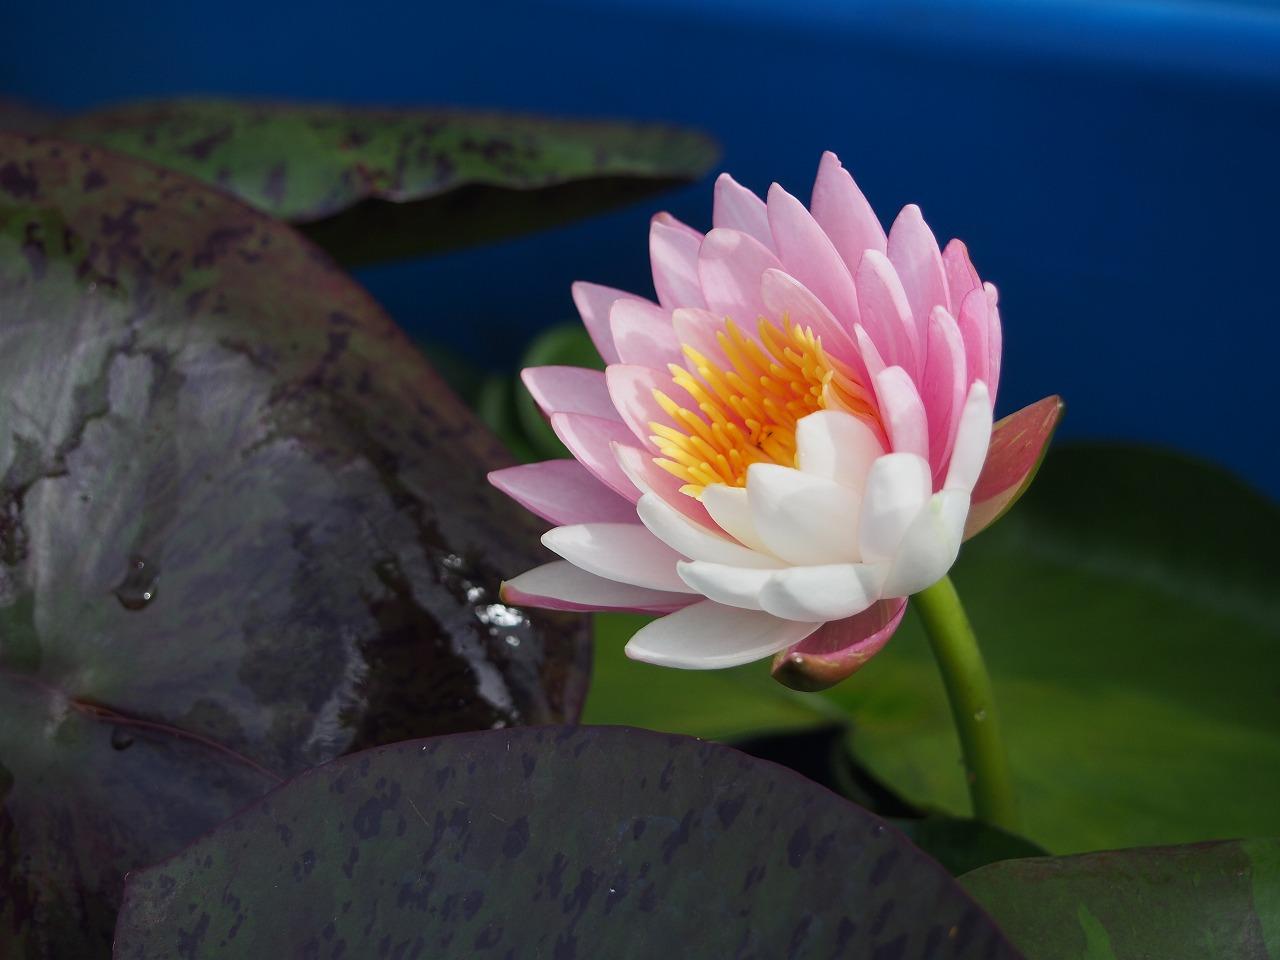 20170703-PinkDawn-O03.jpg